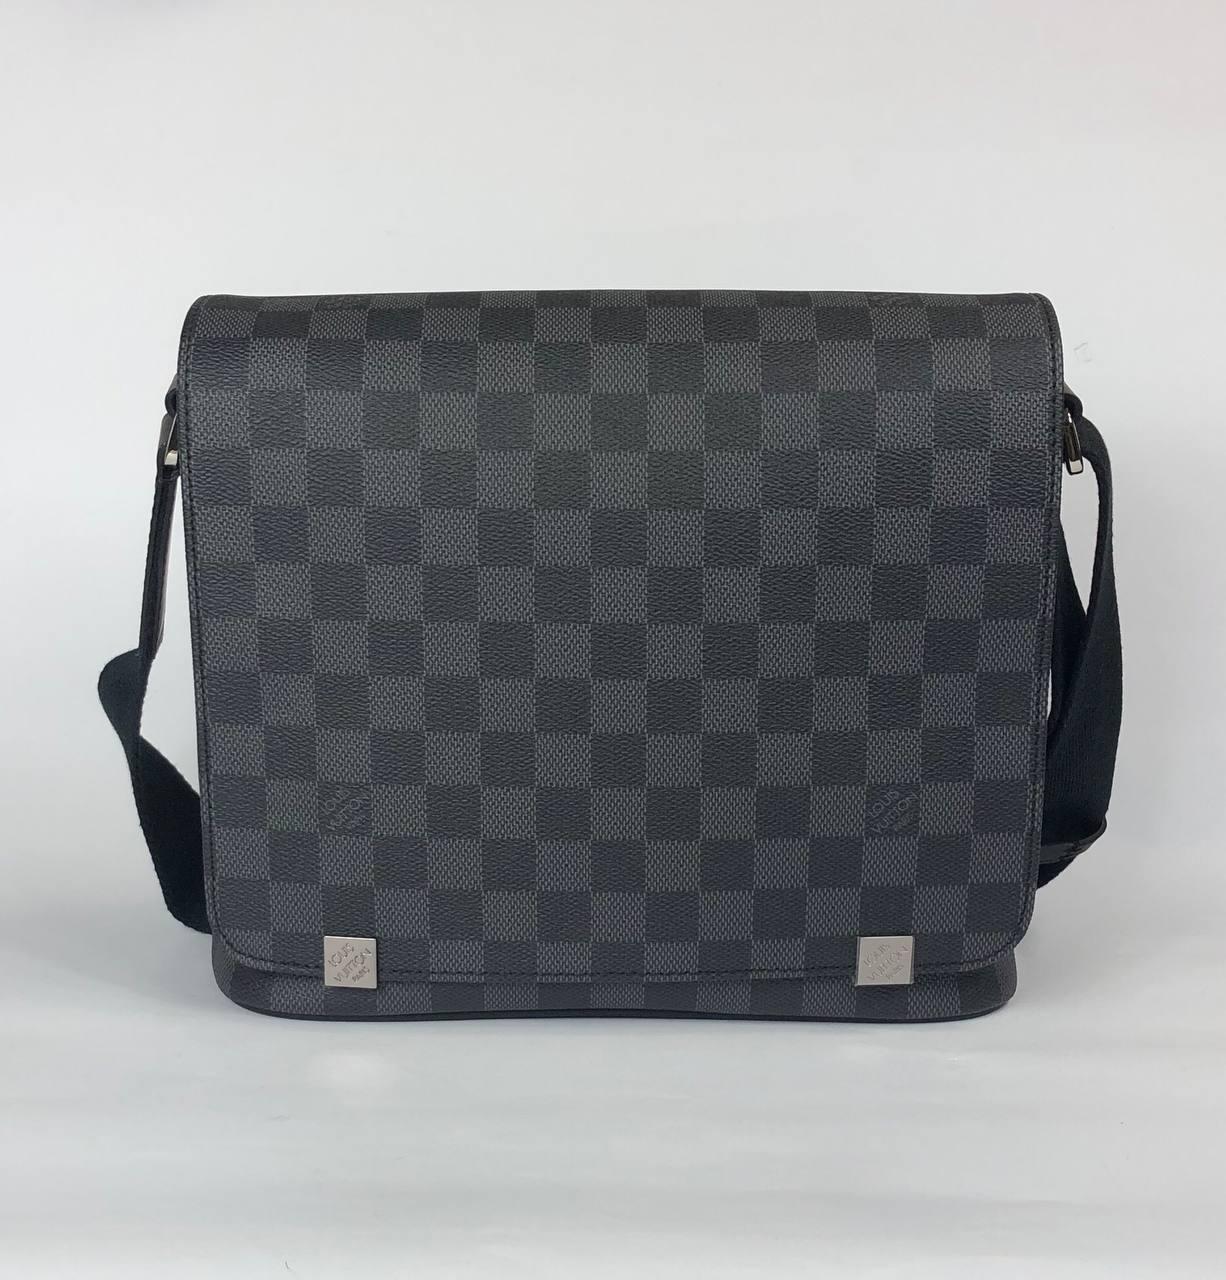 Мужская сумка мессенджер - Louis Vuitton District GM